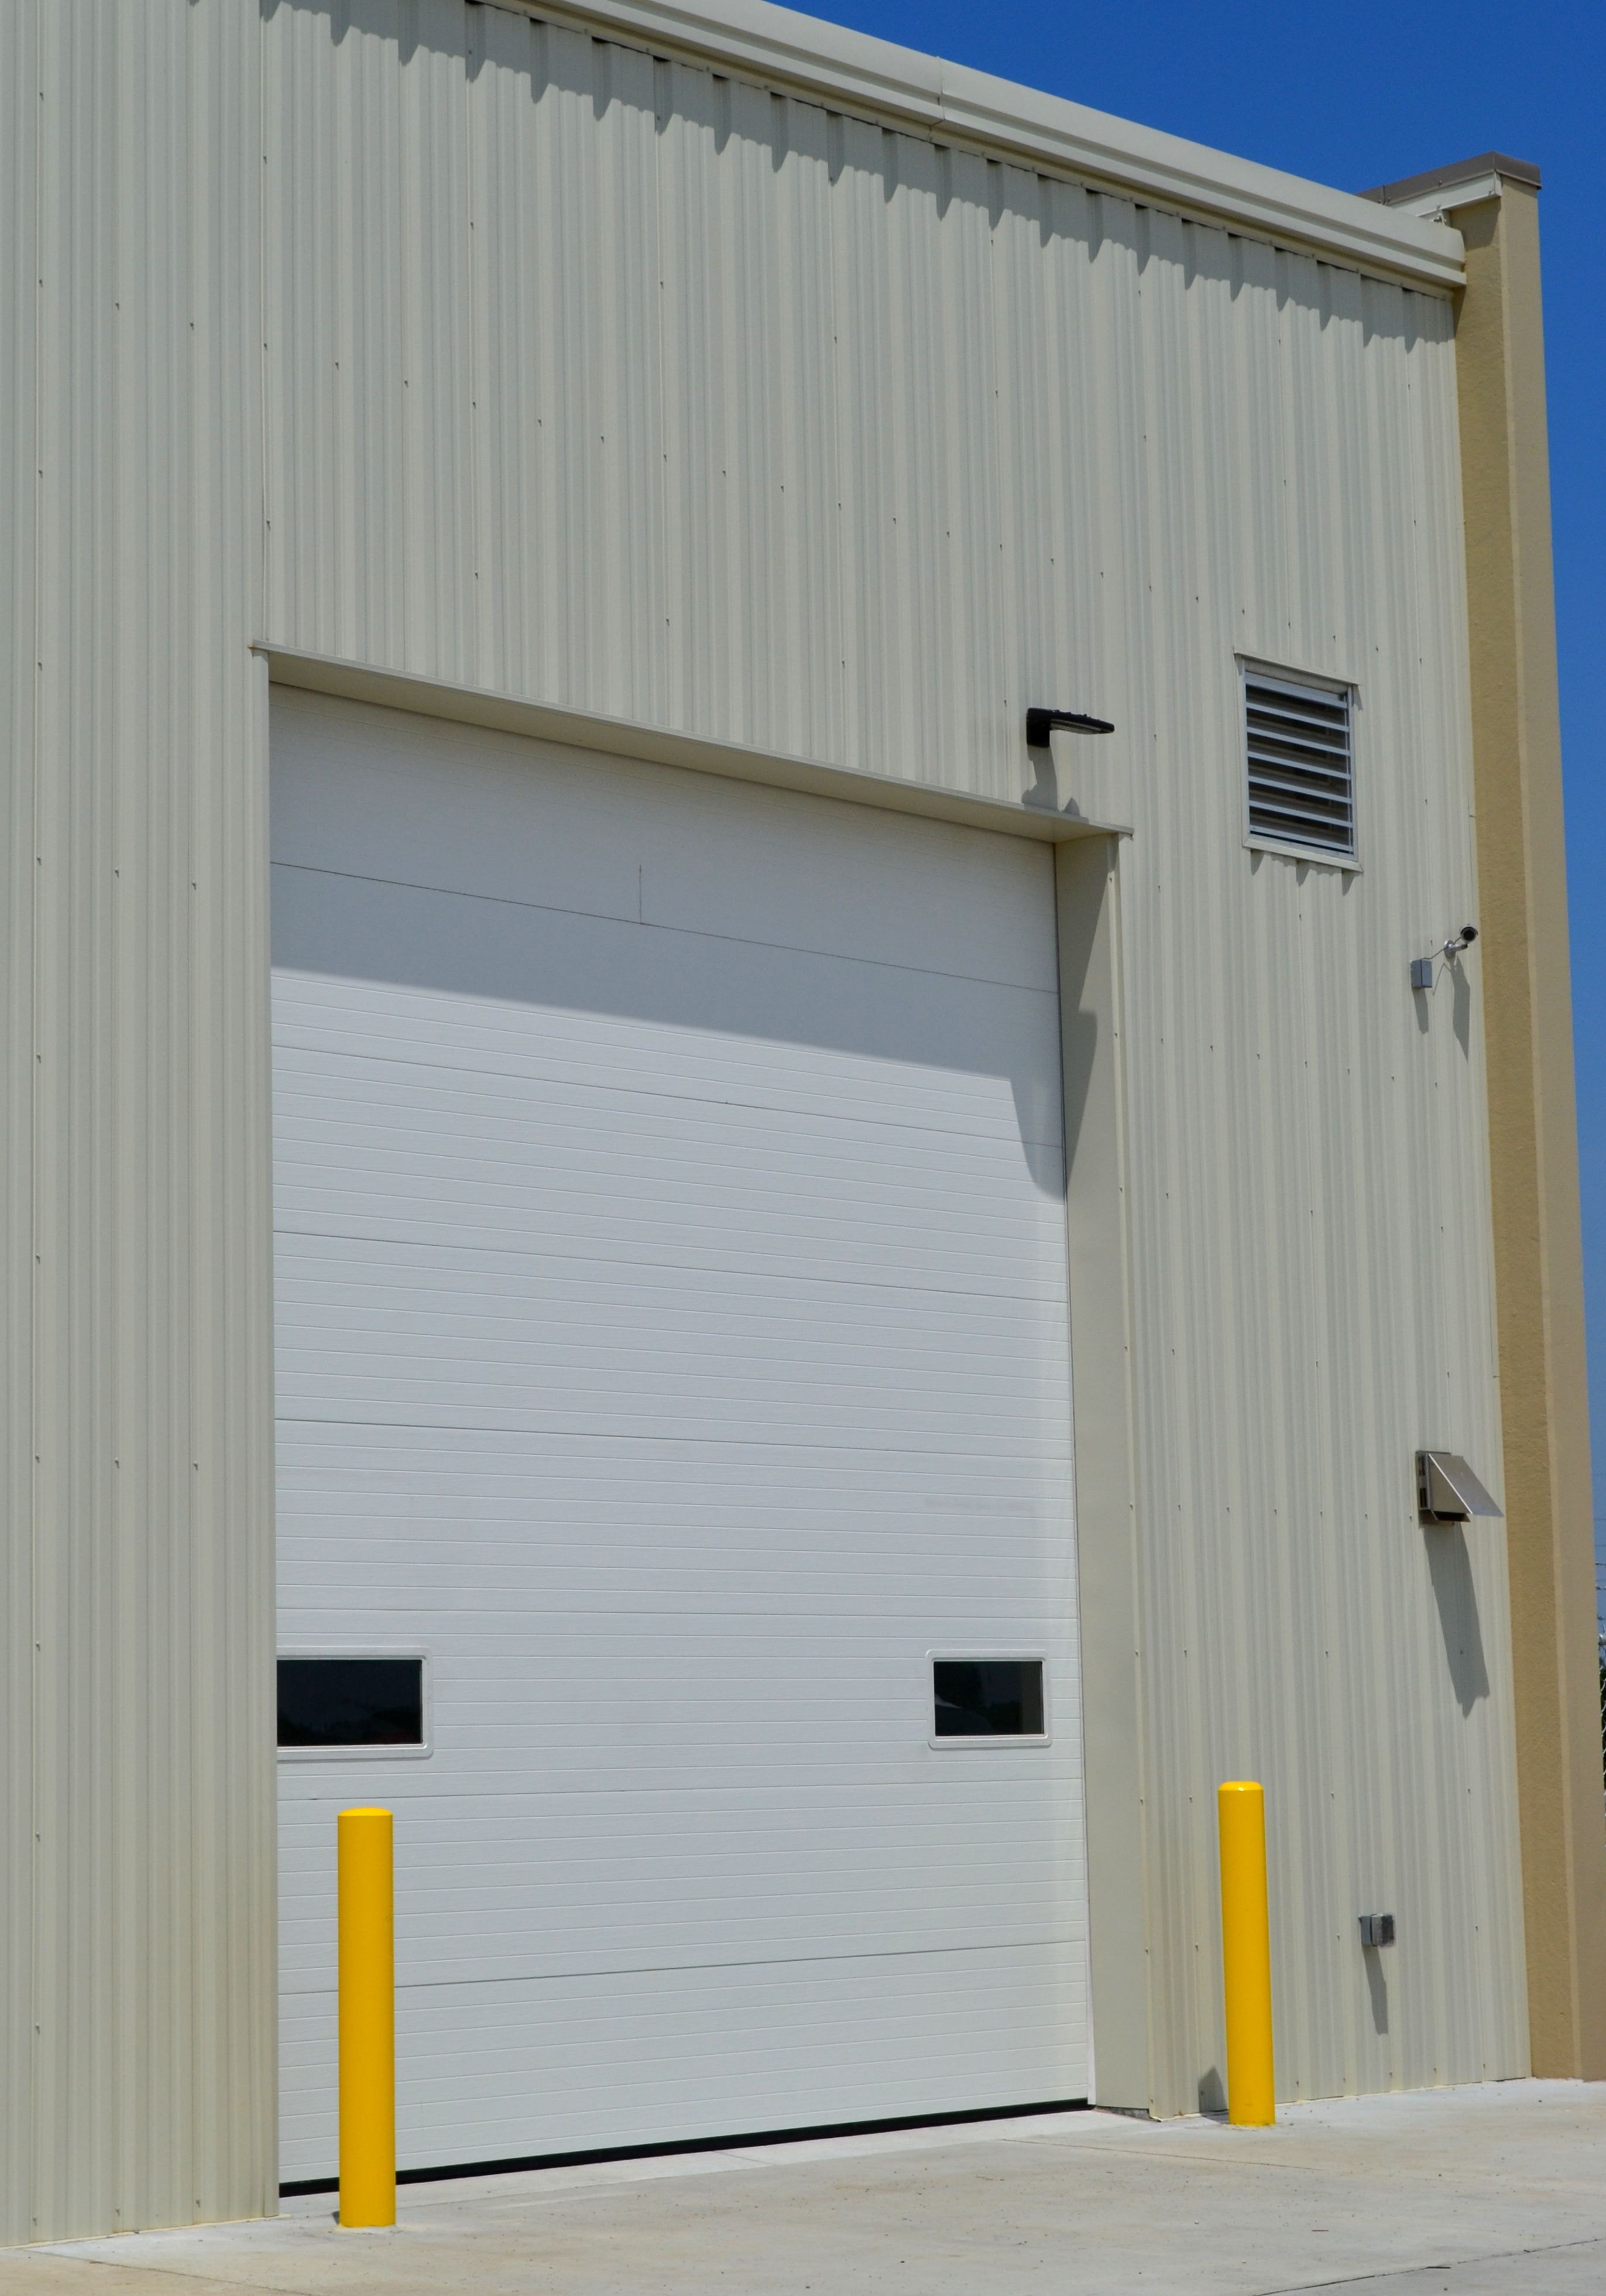 Wayne Dalton Of Central Iowa Is A Privately Owned Garage Door Company Servicing Des Moines West Des M Garage Doors Commercial Garage Doors Garage Door Company